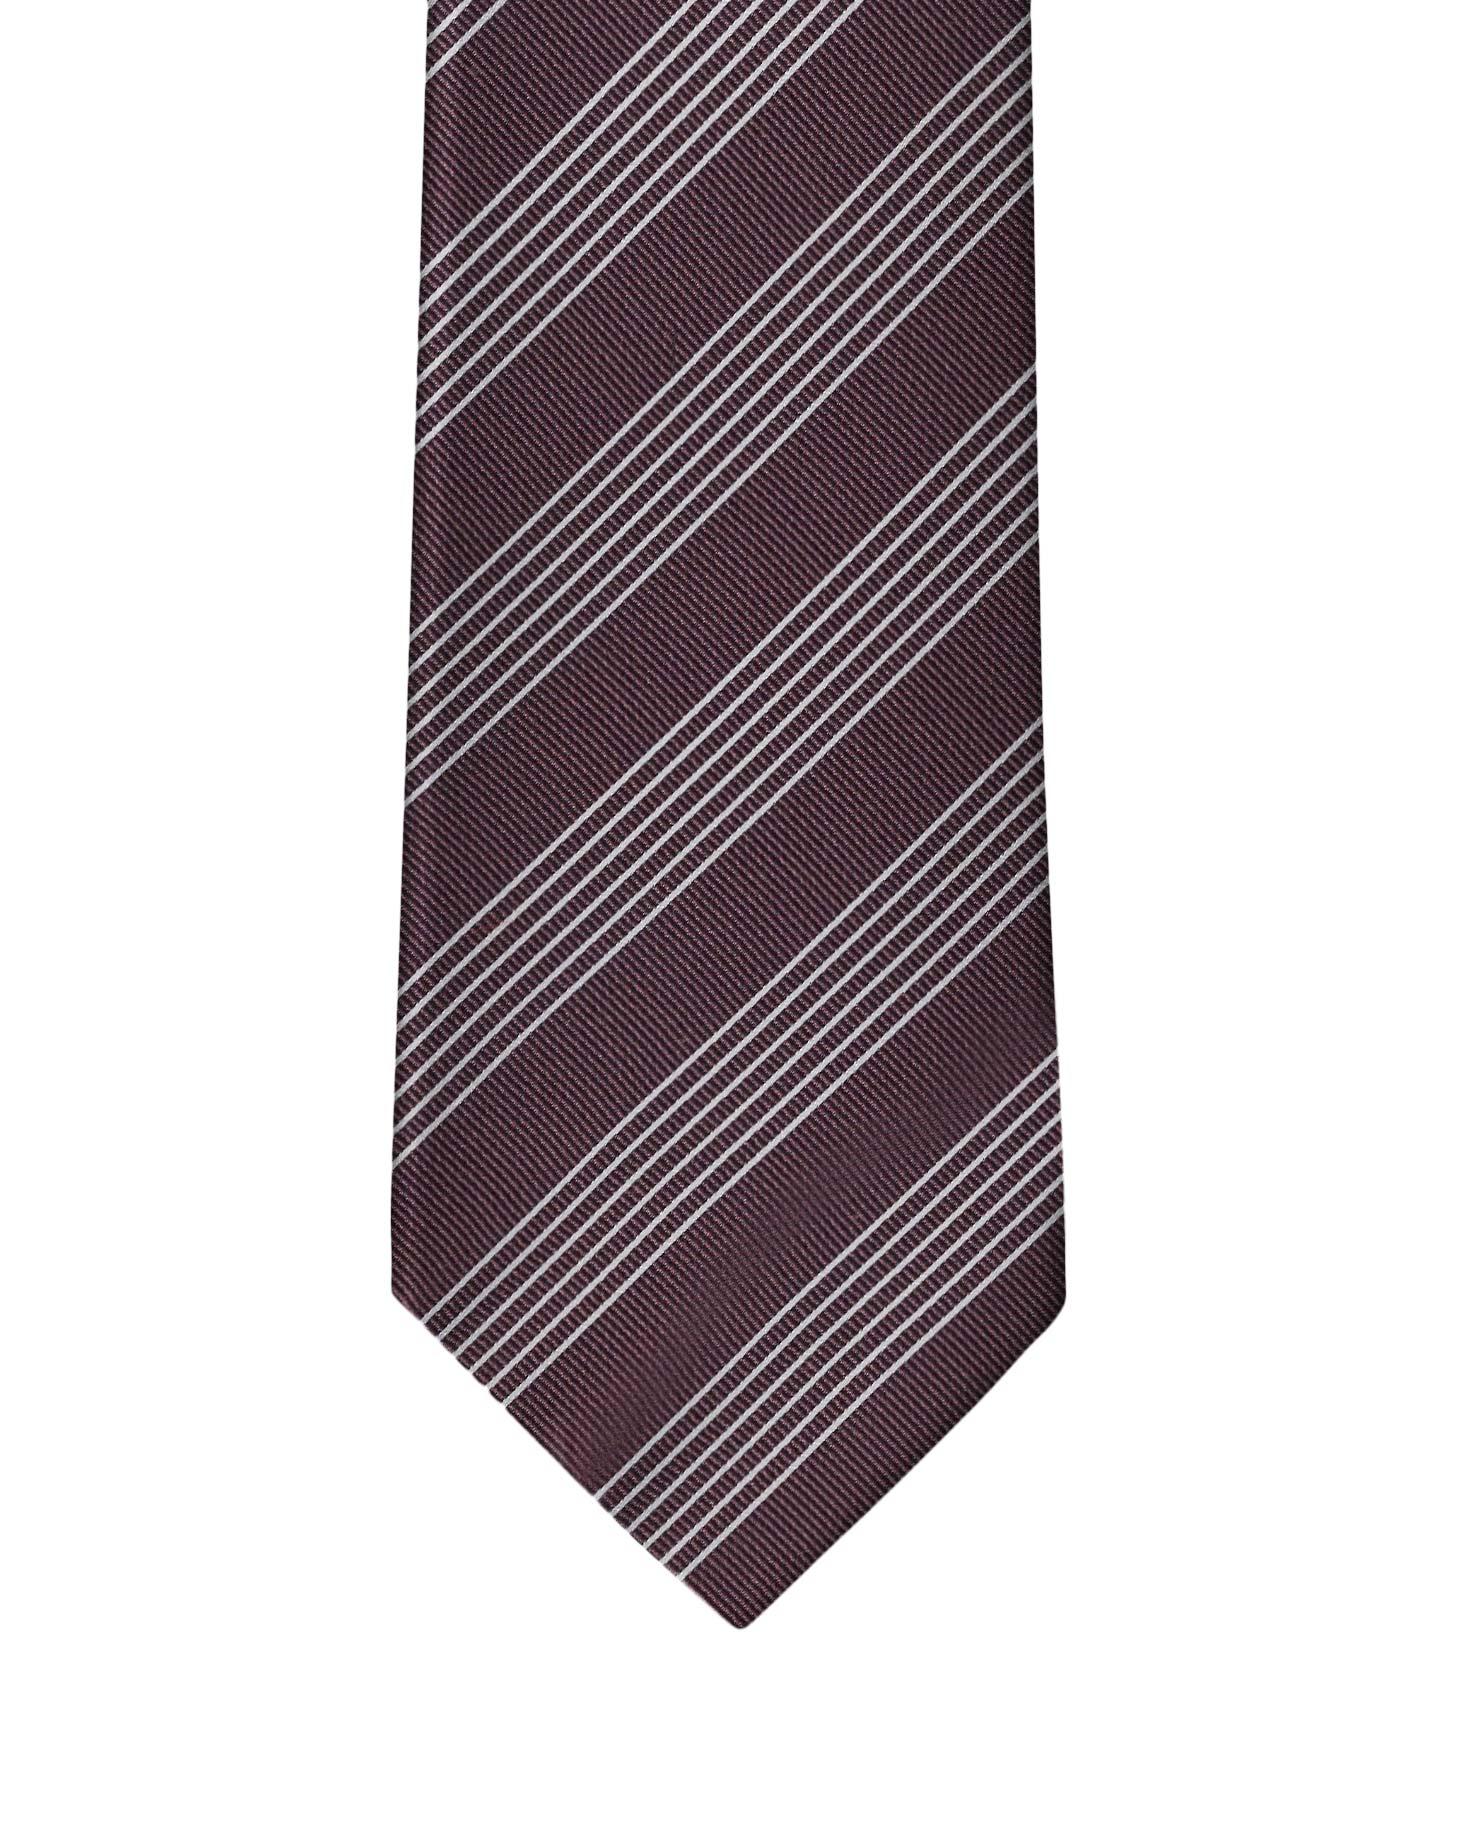 Burgundy Classic Stripe Necktie